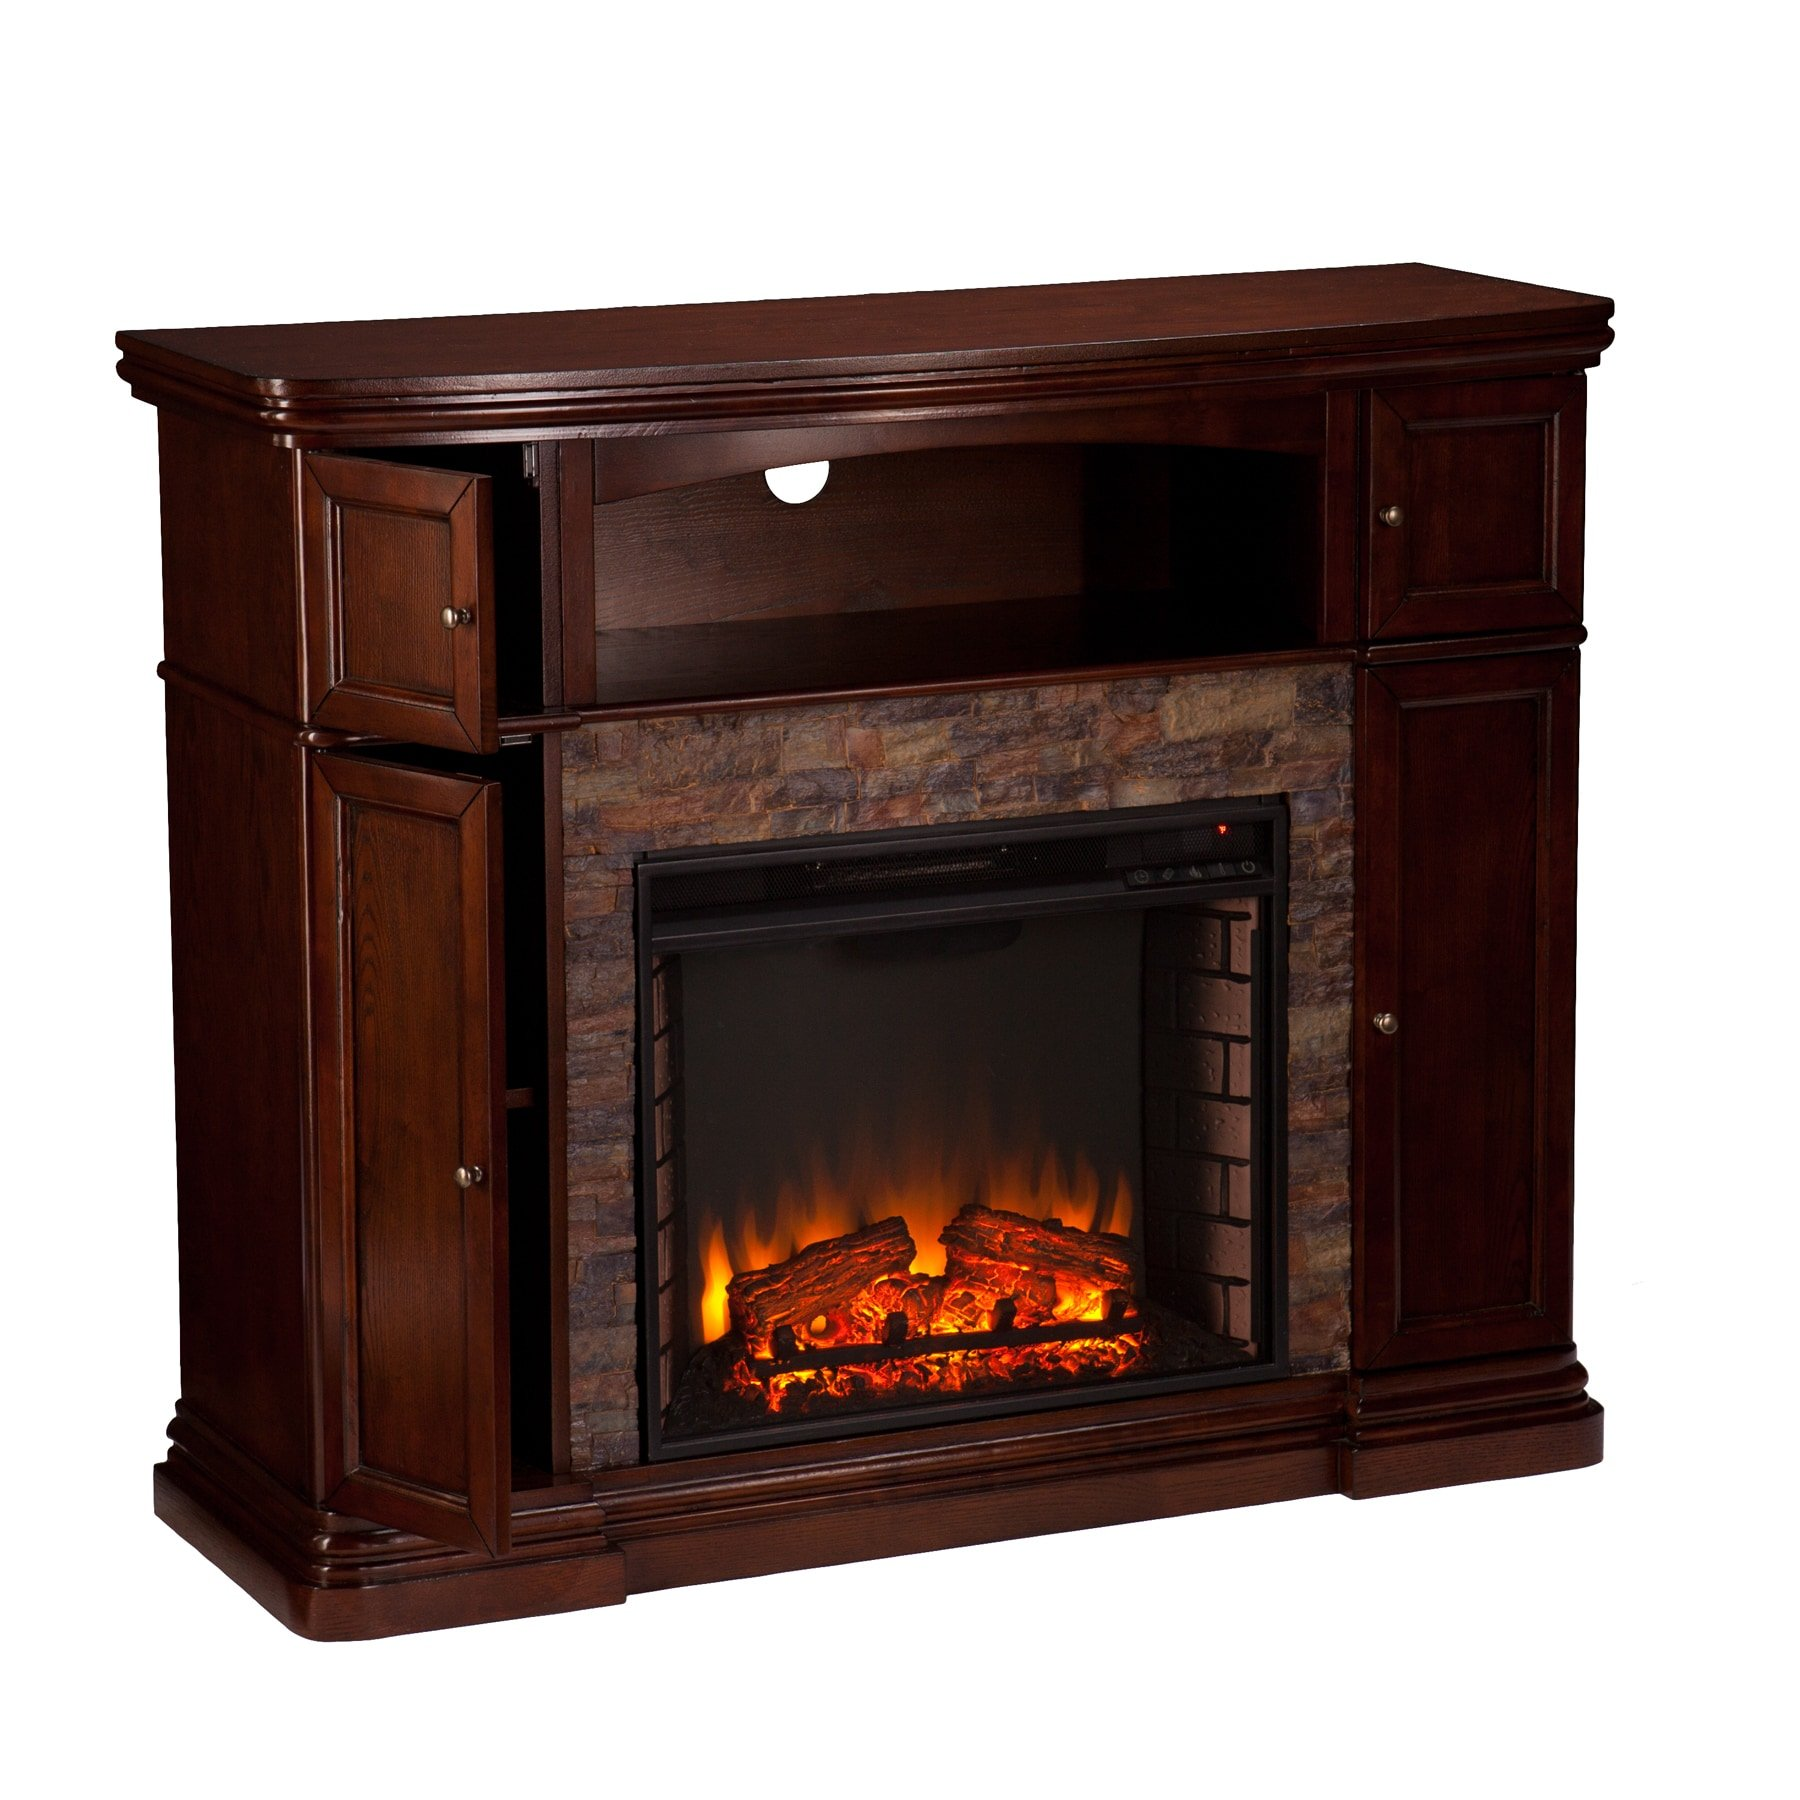 Harper Blvd Davenport Espresso Faux Stone Electric Media Fireplace by Harper Blvd (Image #4)